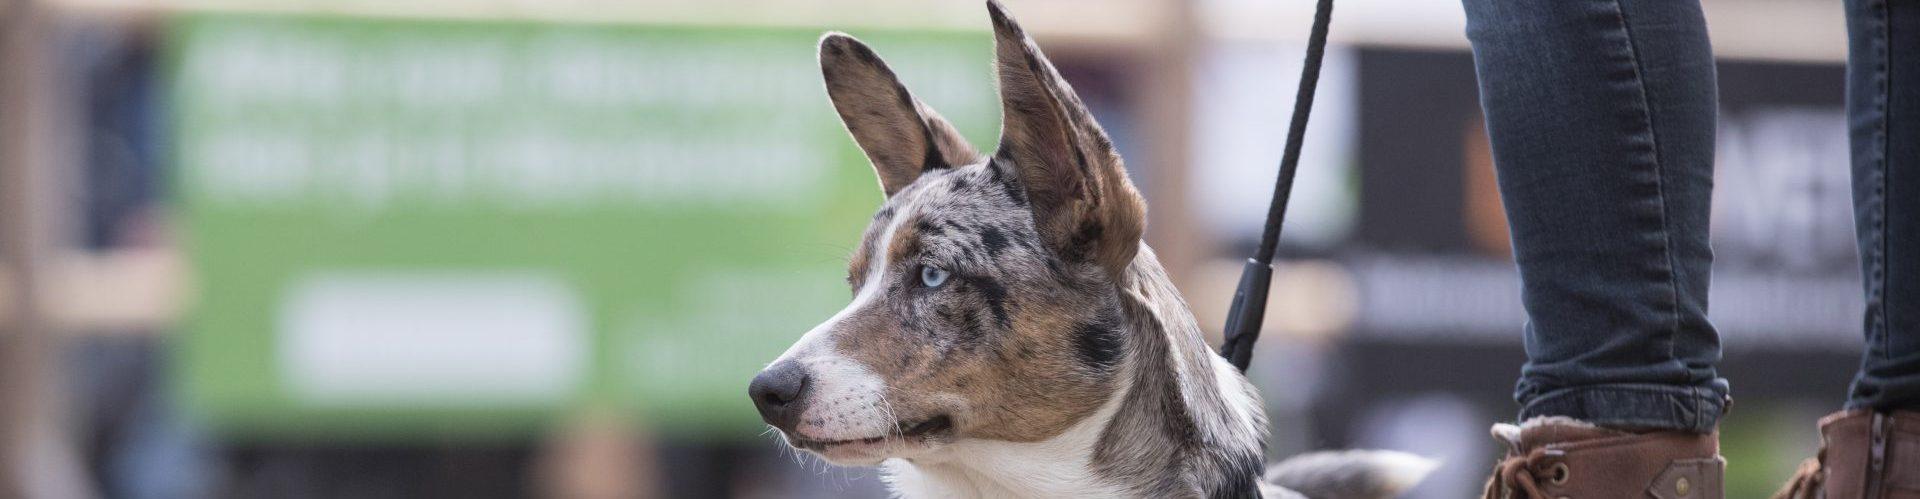 Mooiste Hond van Nederland (1)